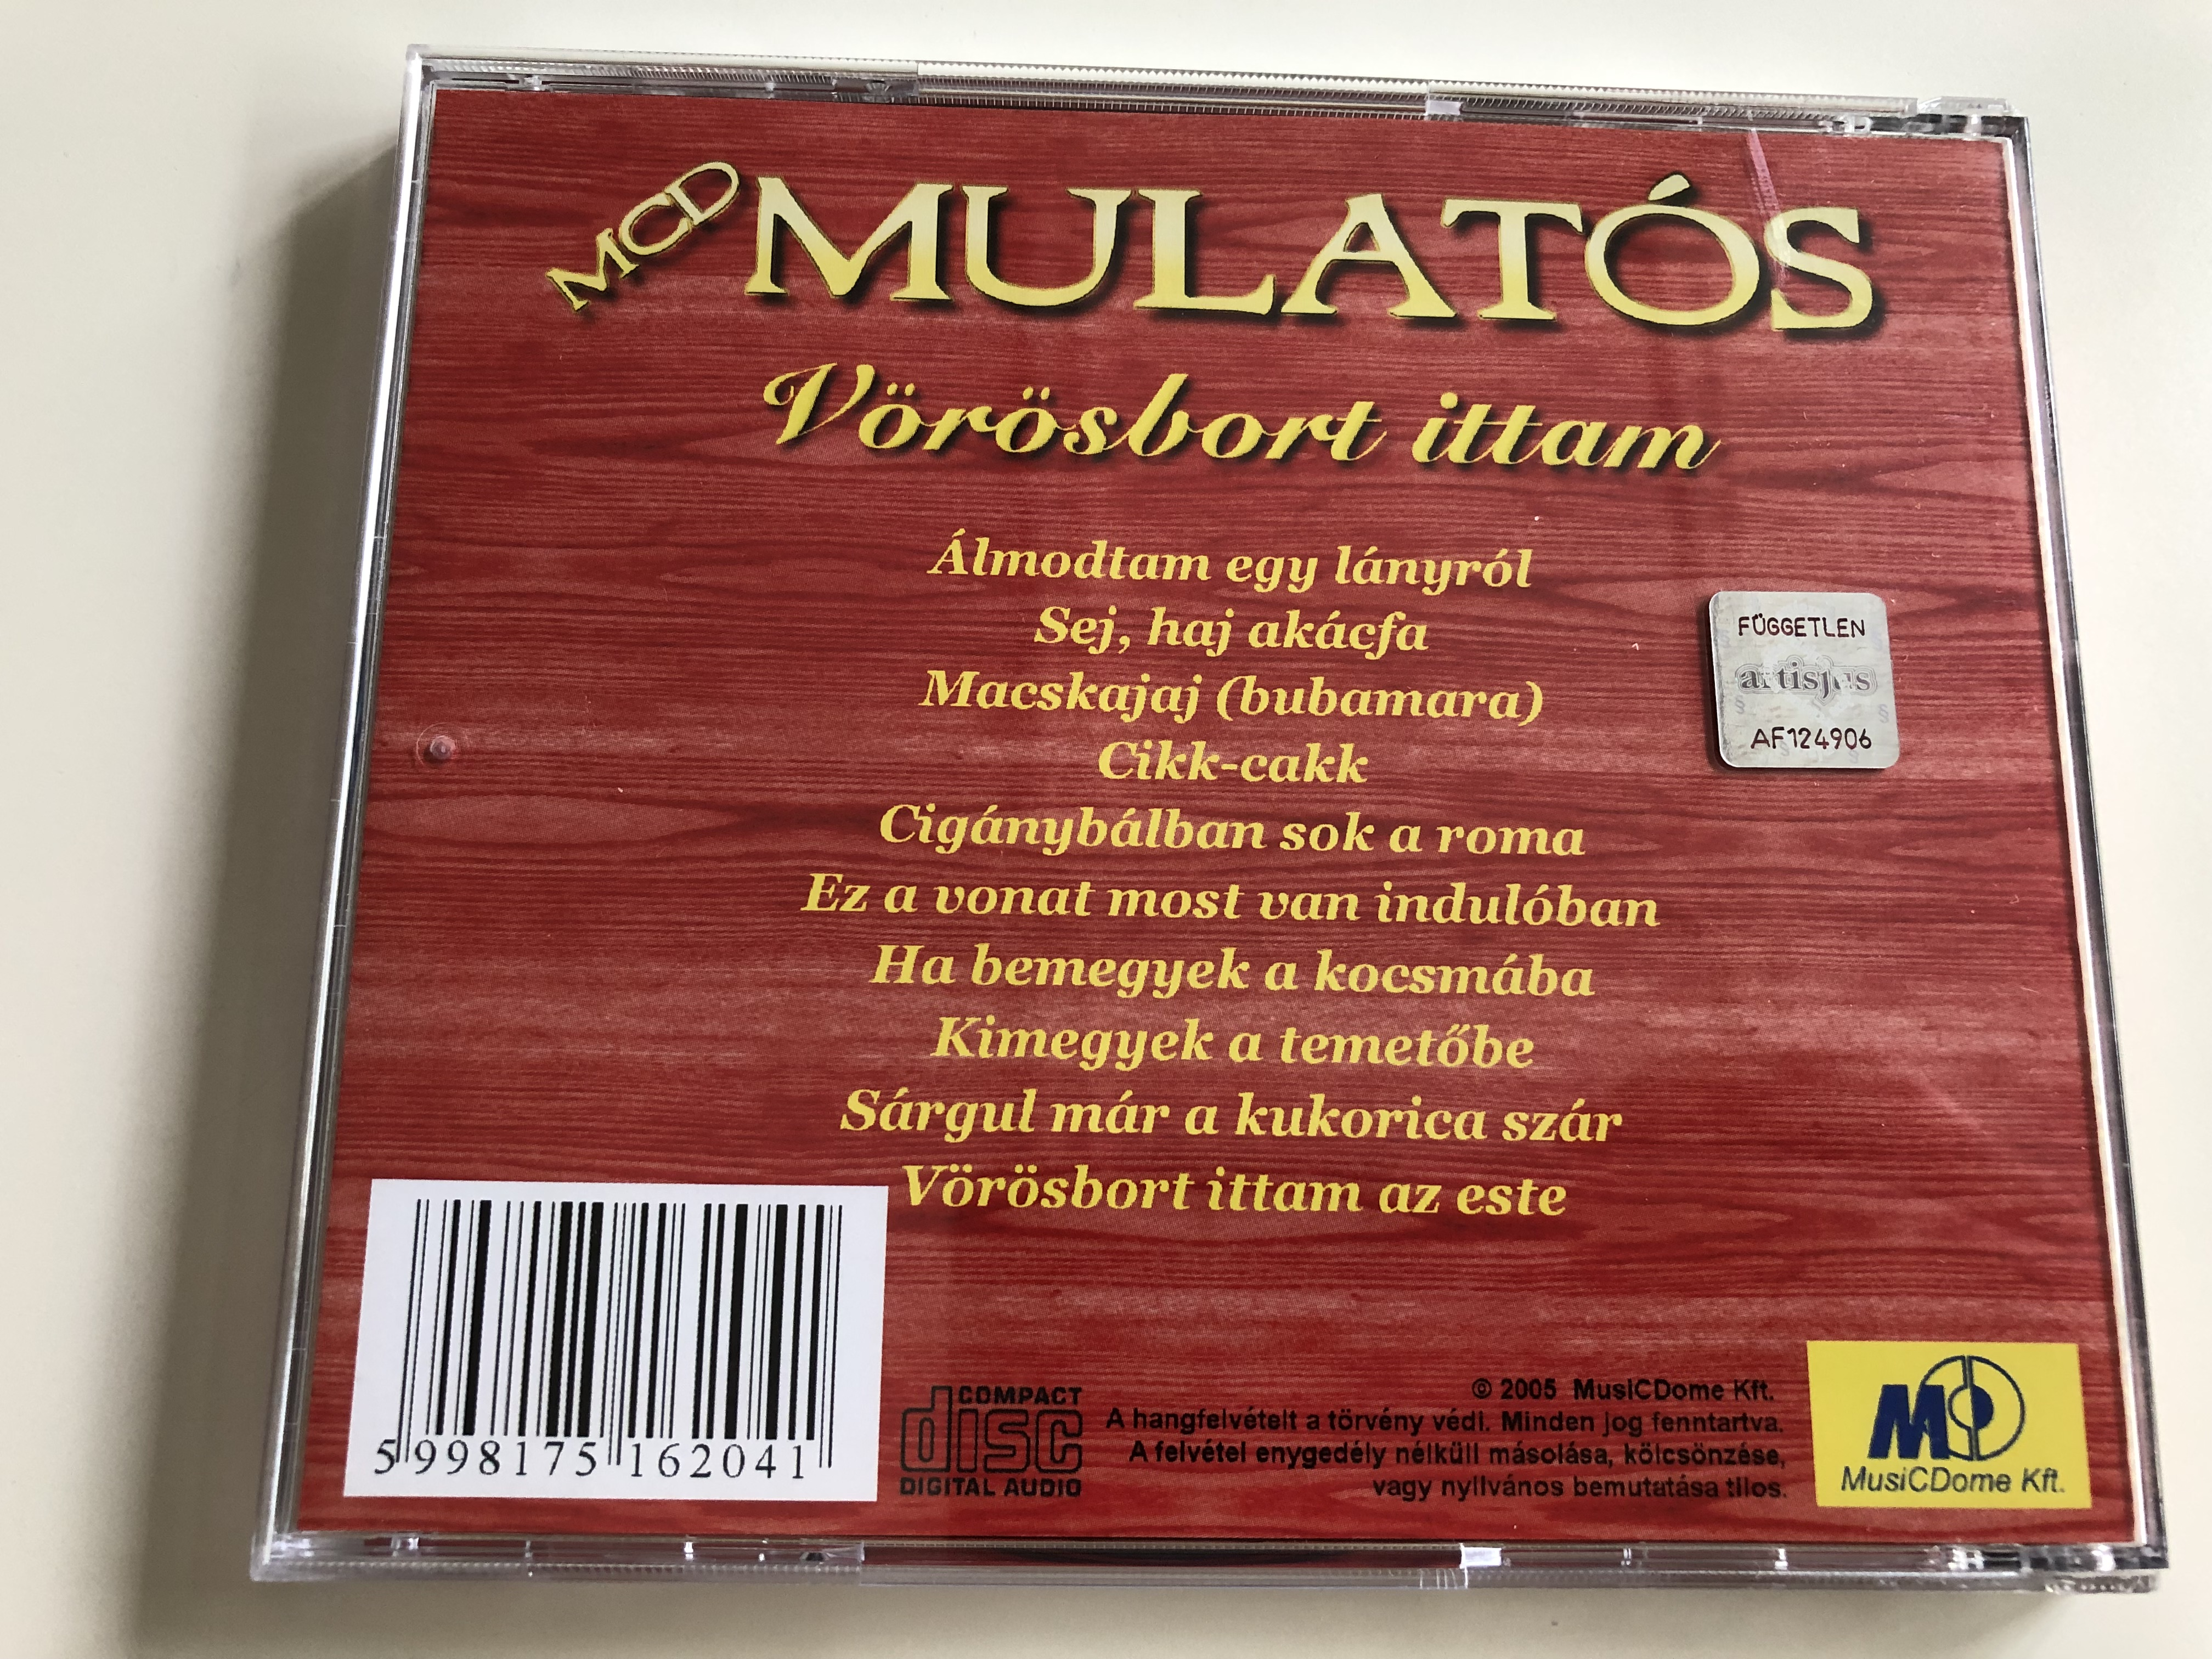 mulat-s-v-r-bort-ittam-sej-ha-ak-cfa-macskajaj-cikk-cak-s-rgul-m-r-a-kukorica-sz-r-audio-cd-2005-musicdome-0322-mcd-4-.jpg